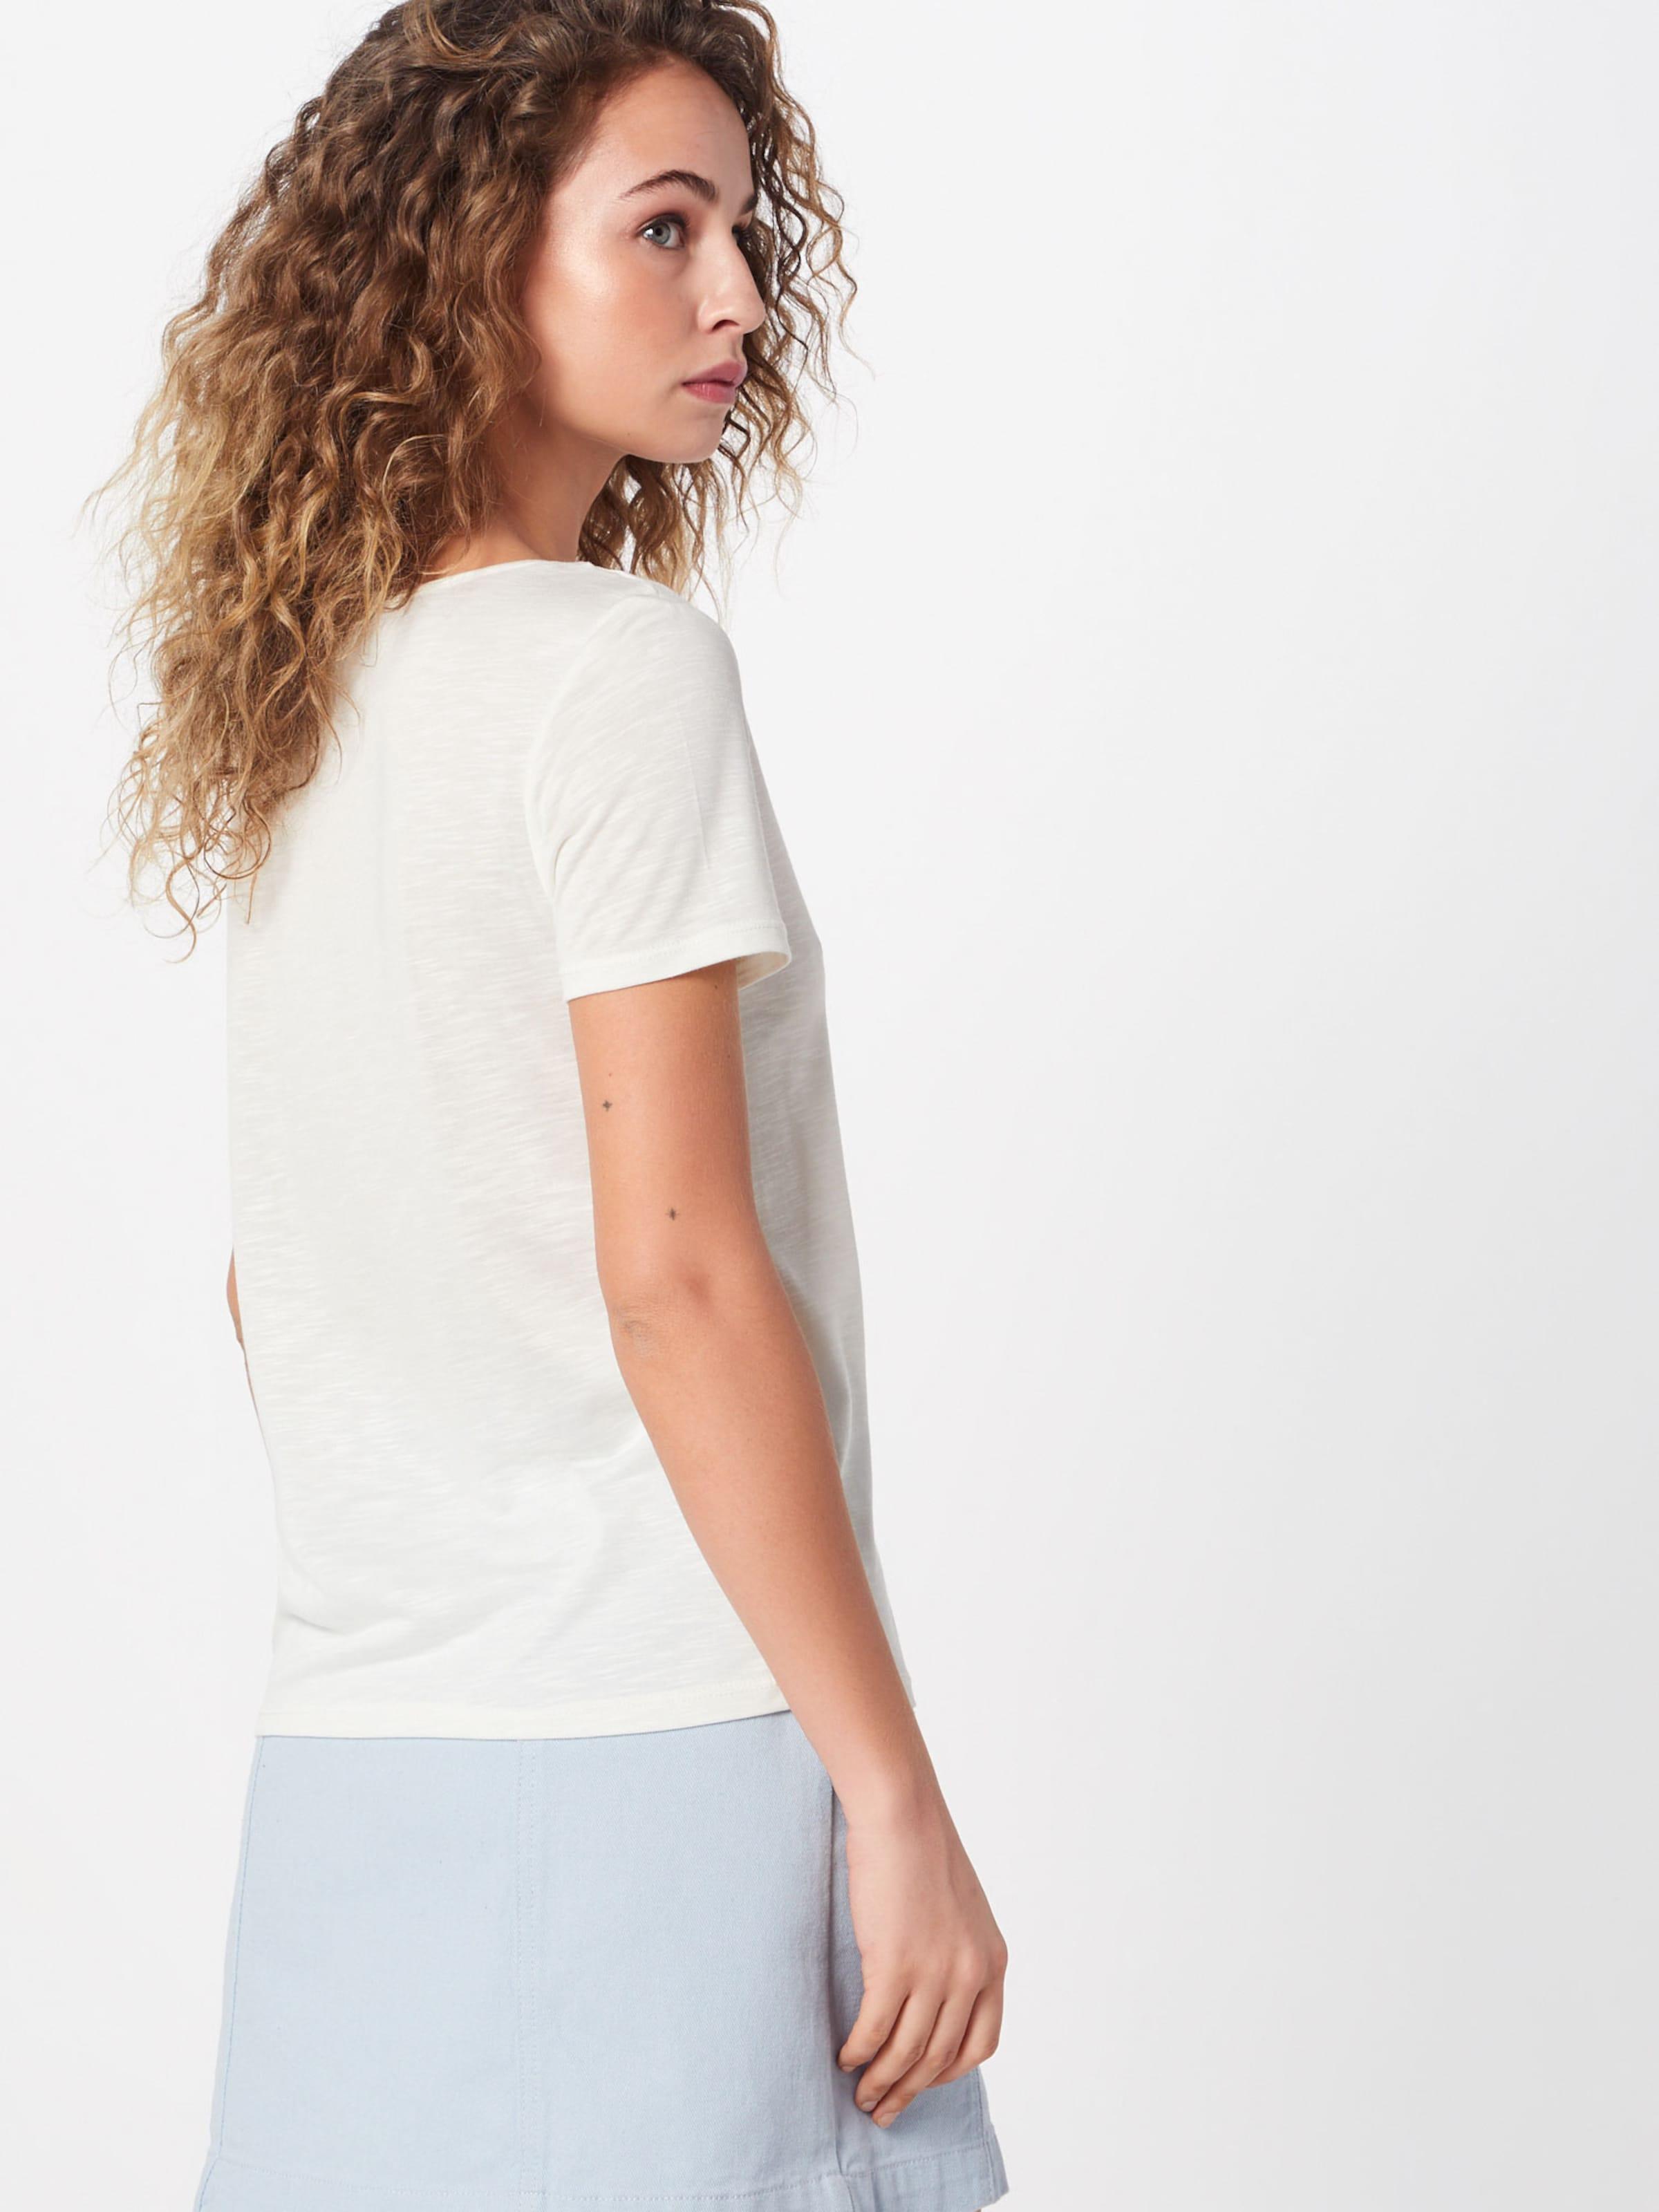 In In Weiß Weiß In Shirt Shirt Vila Vila Shirt Vila MSzqUVpG